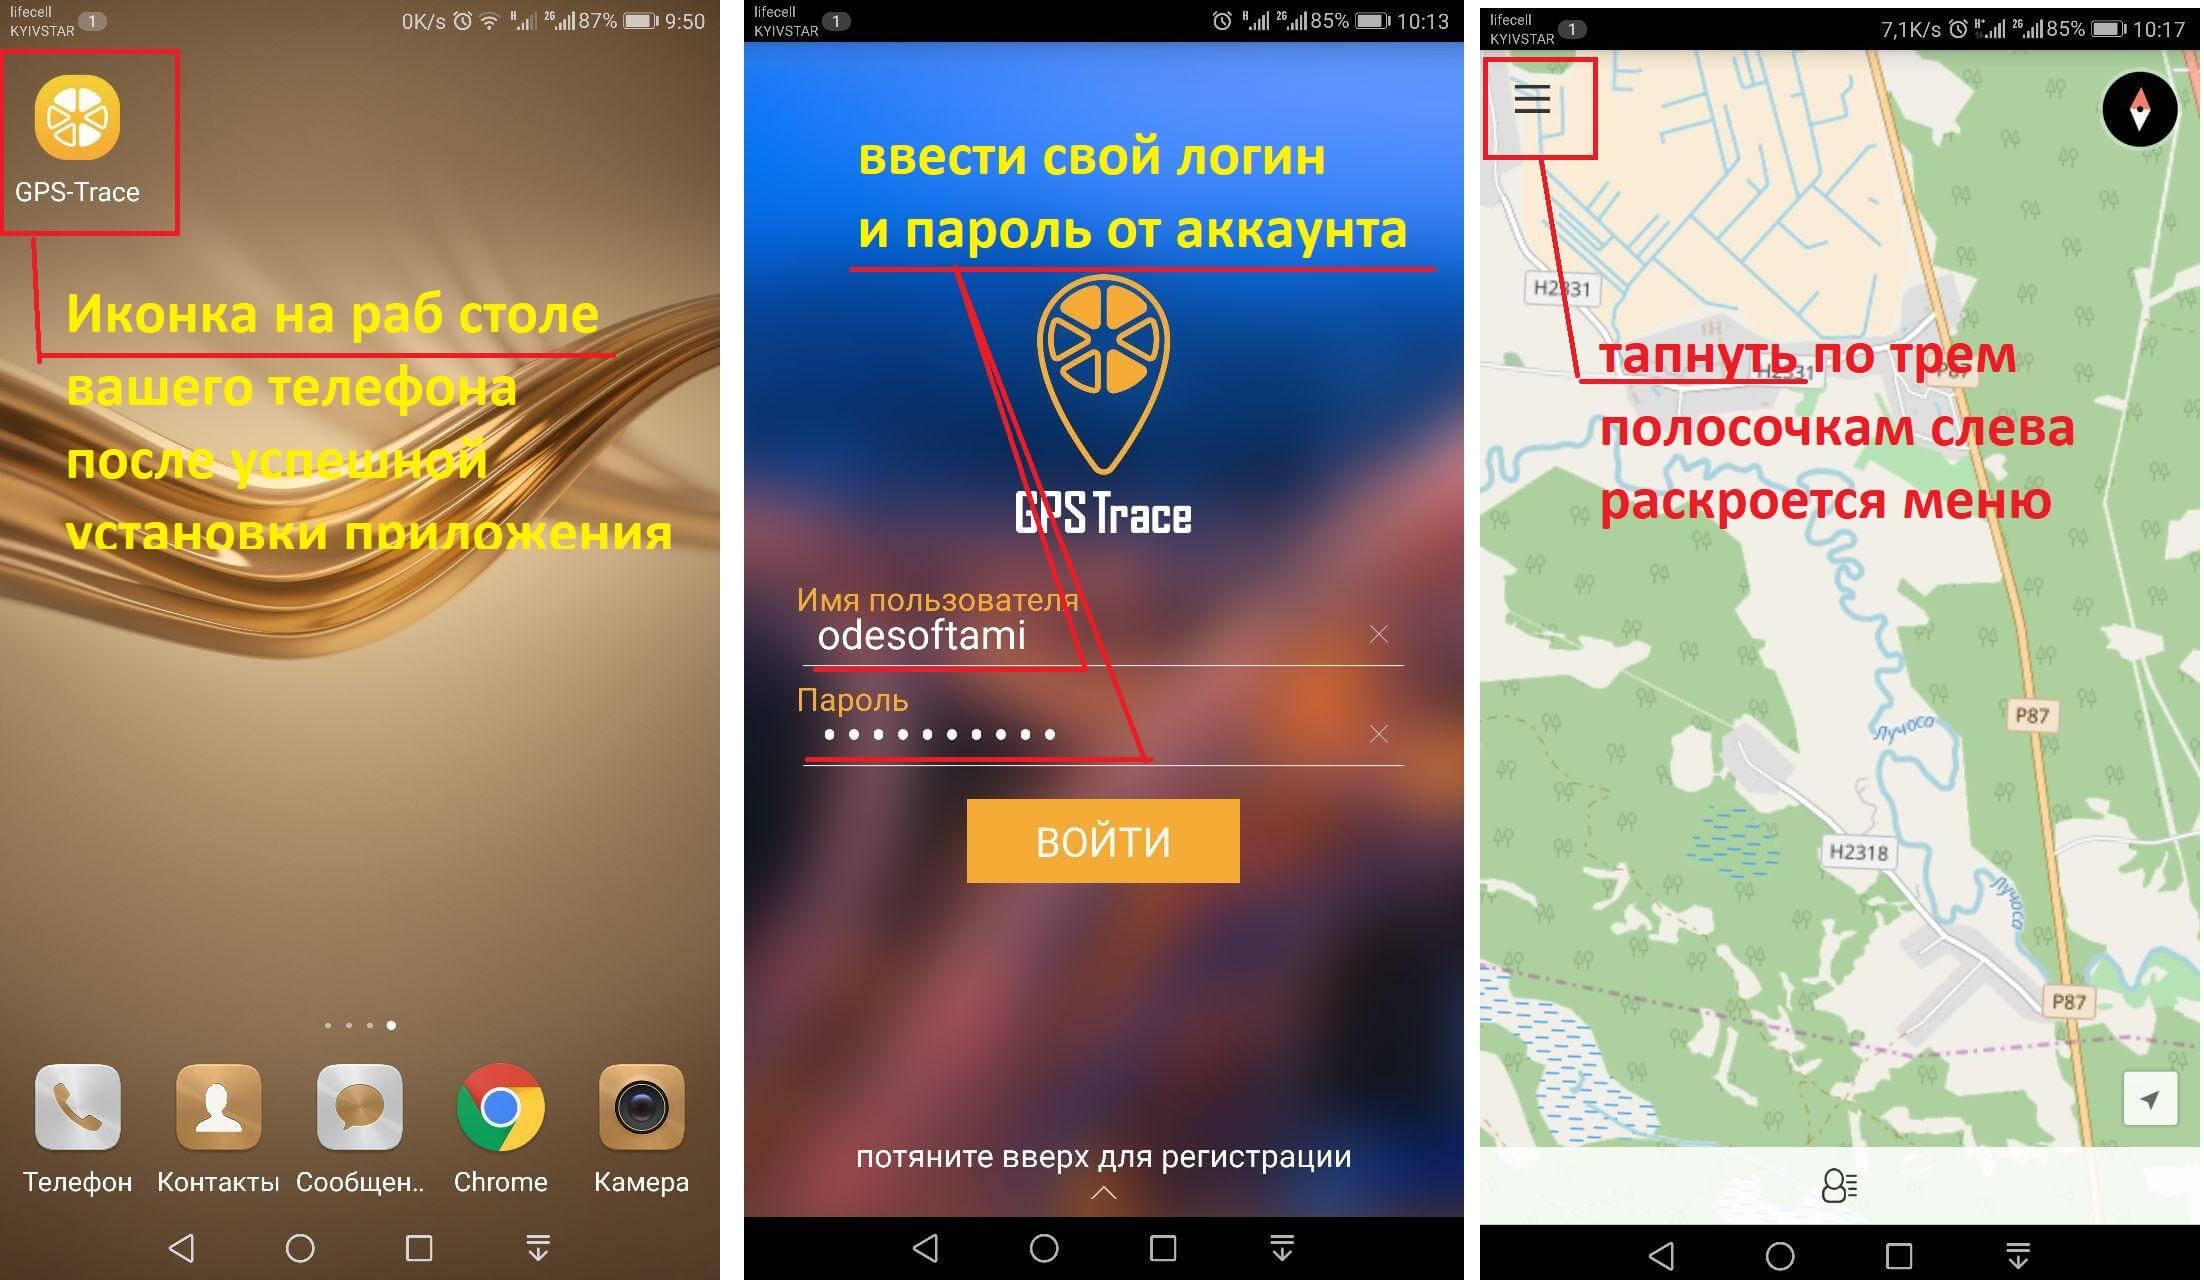 Приложение orange для Android / IOS